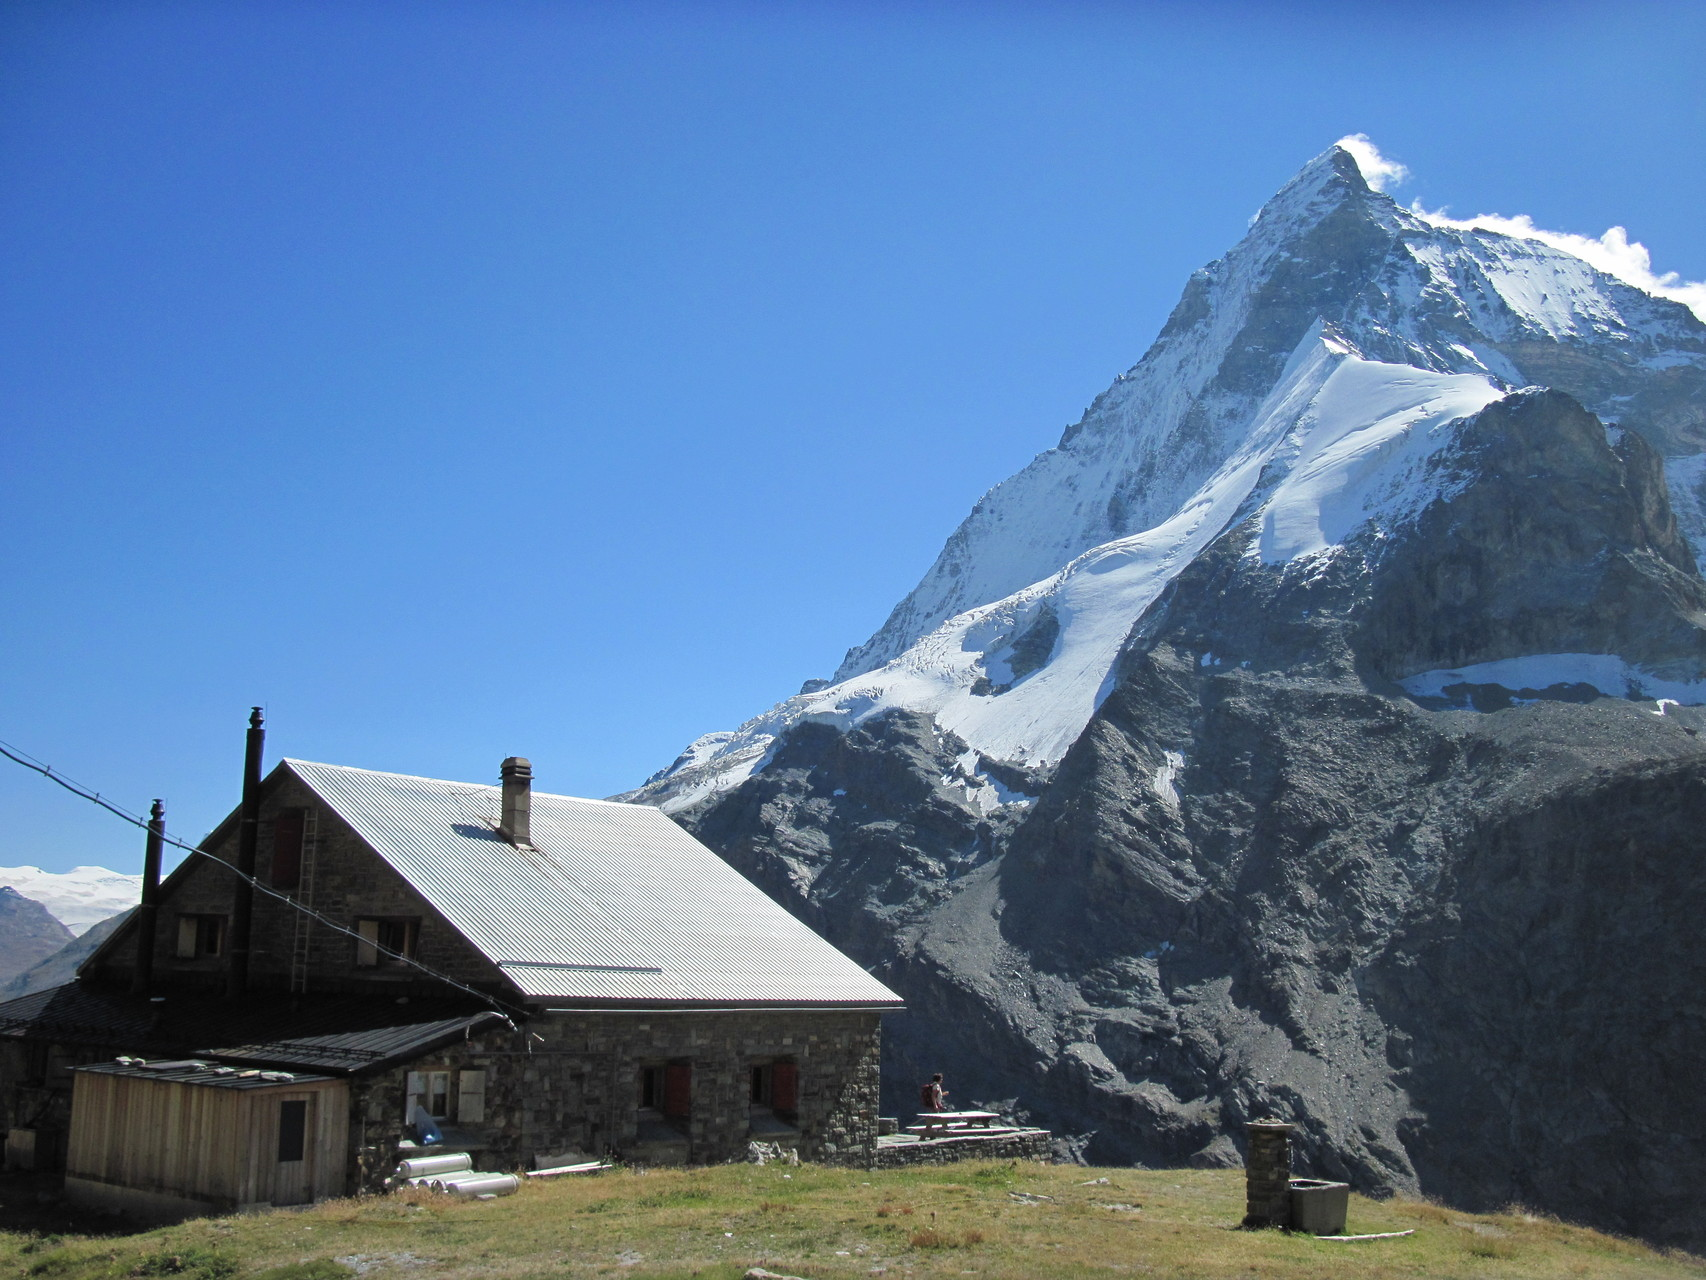 Hütte mit Matterhorn